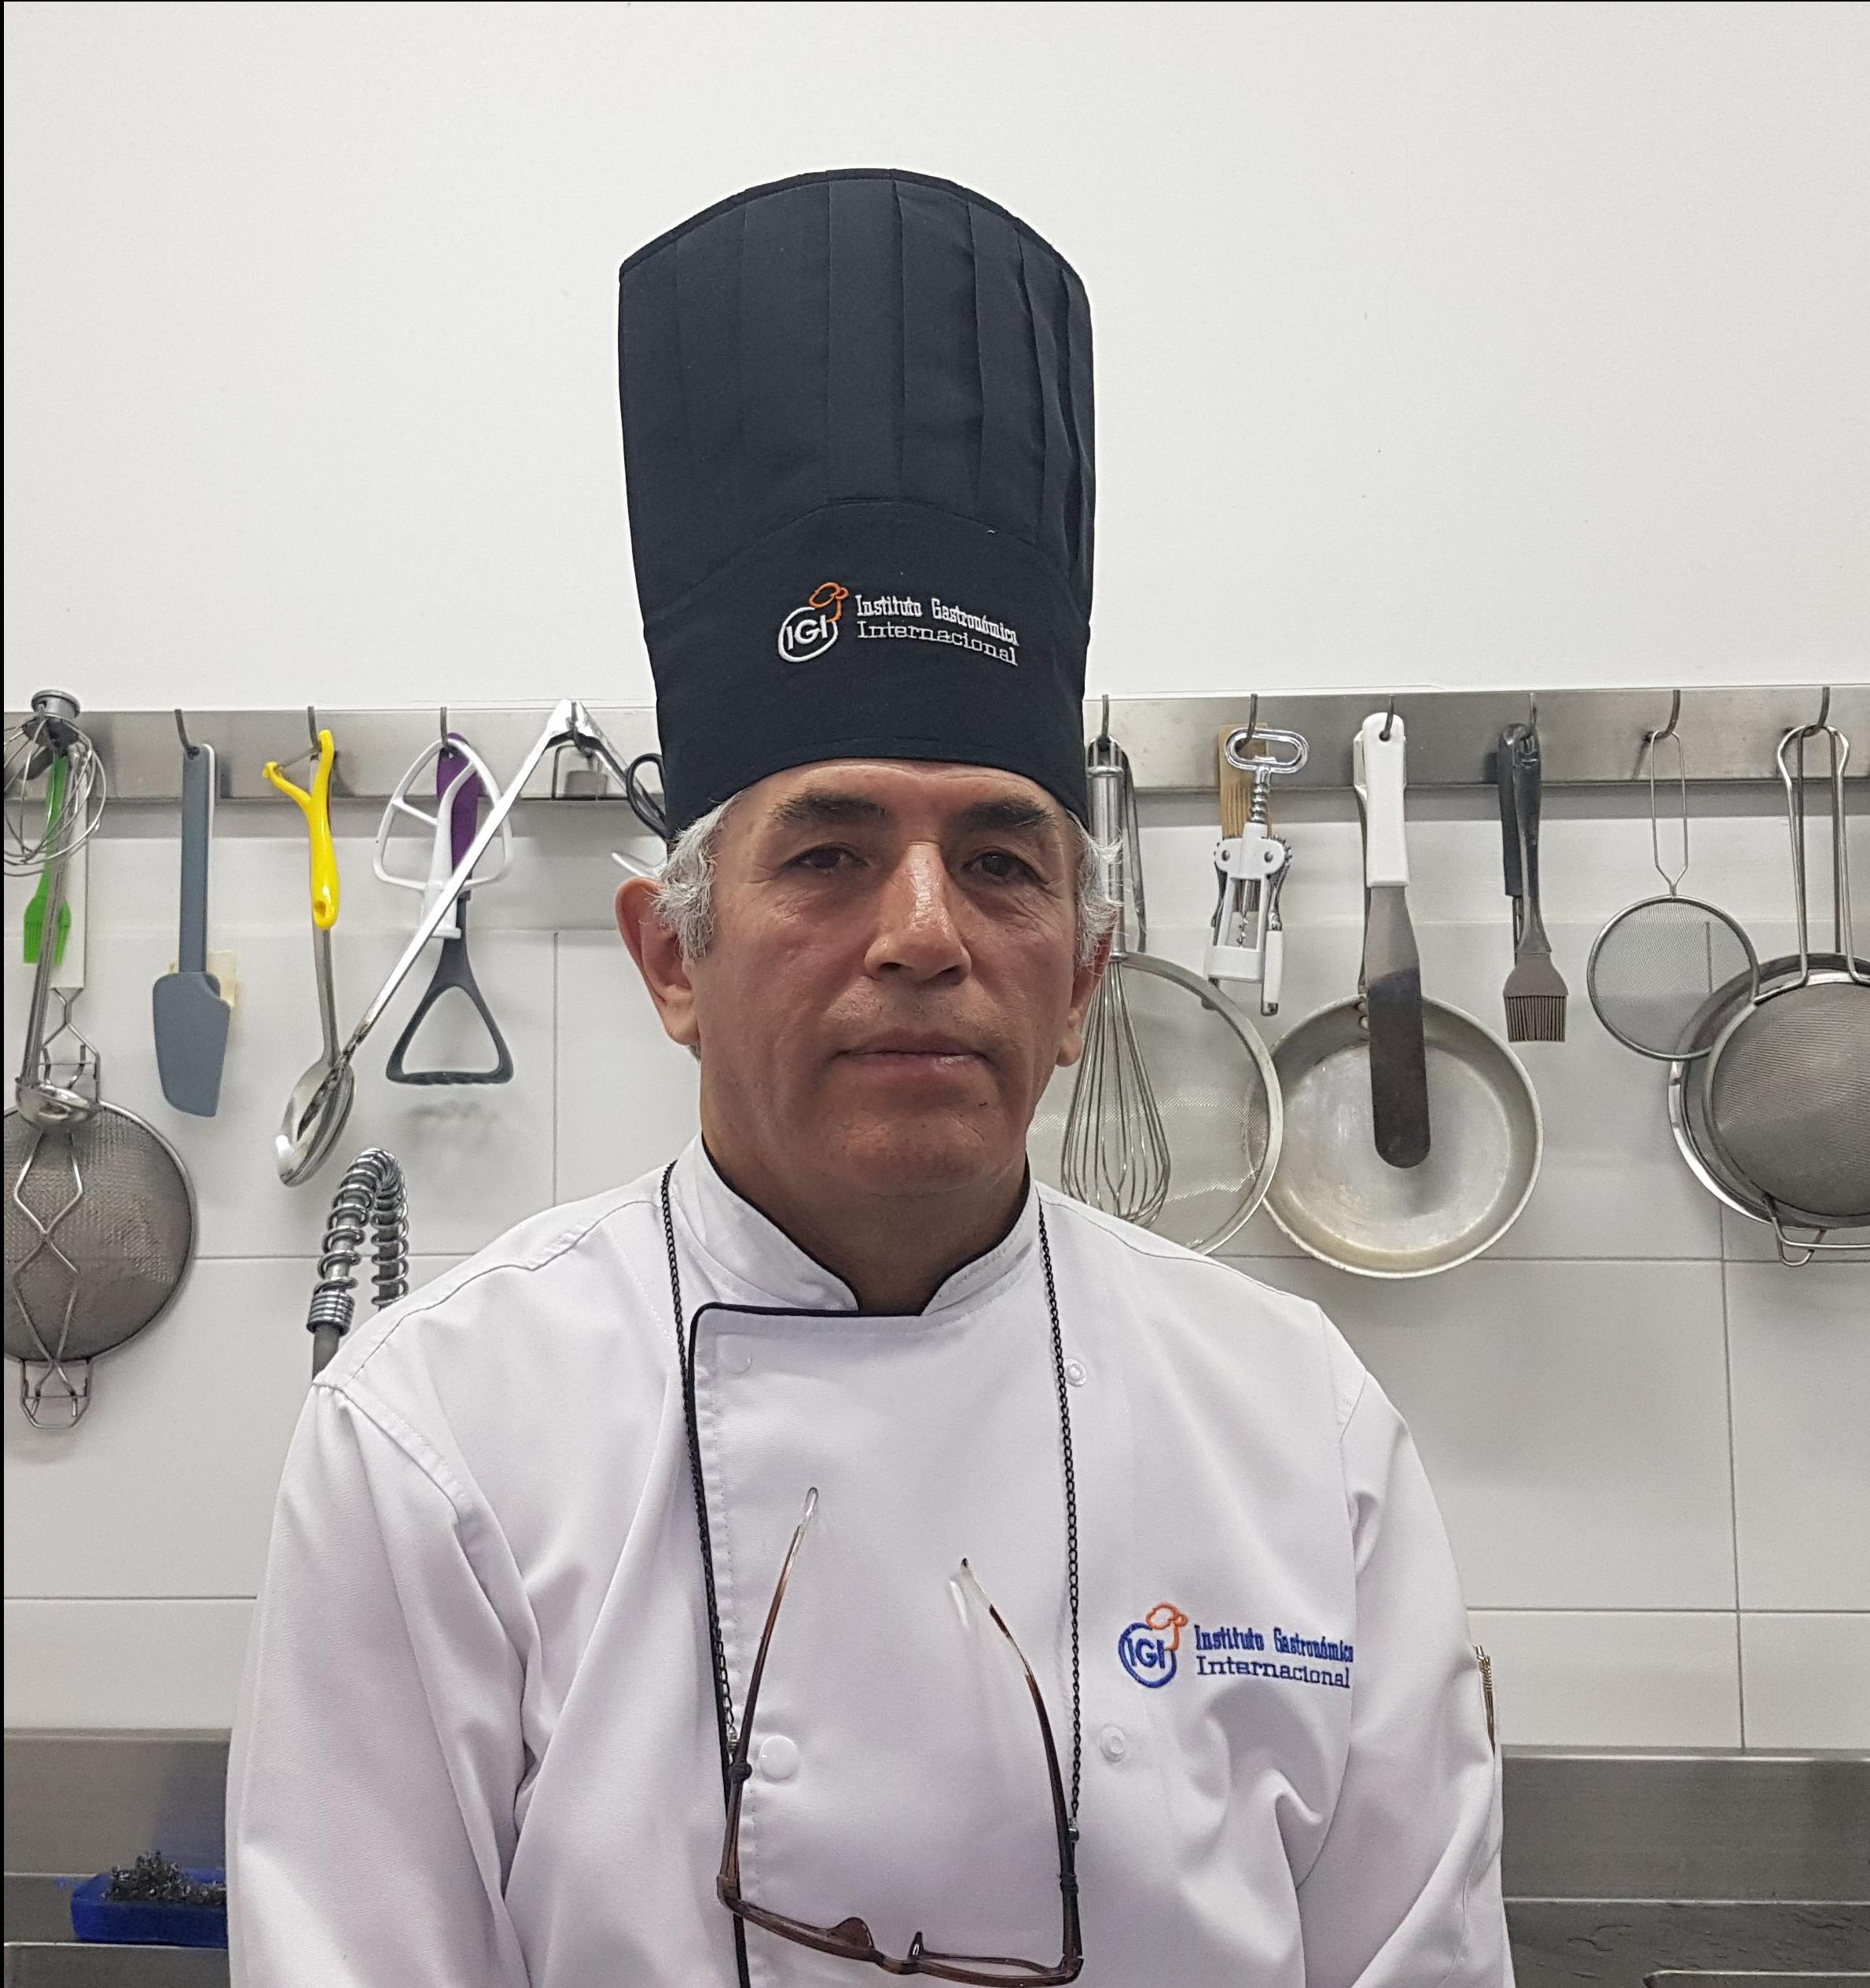 Gilberto S. Panadero